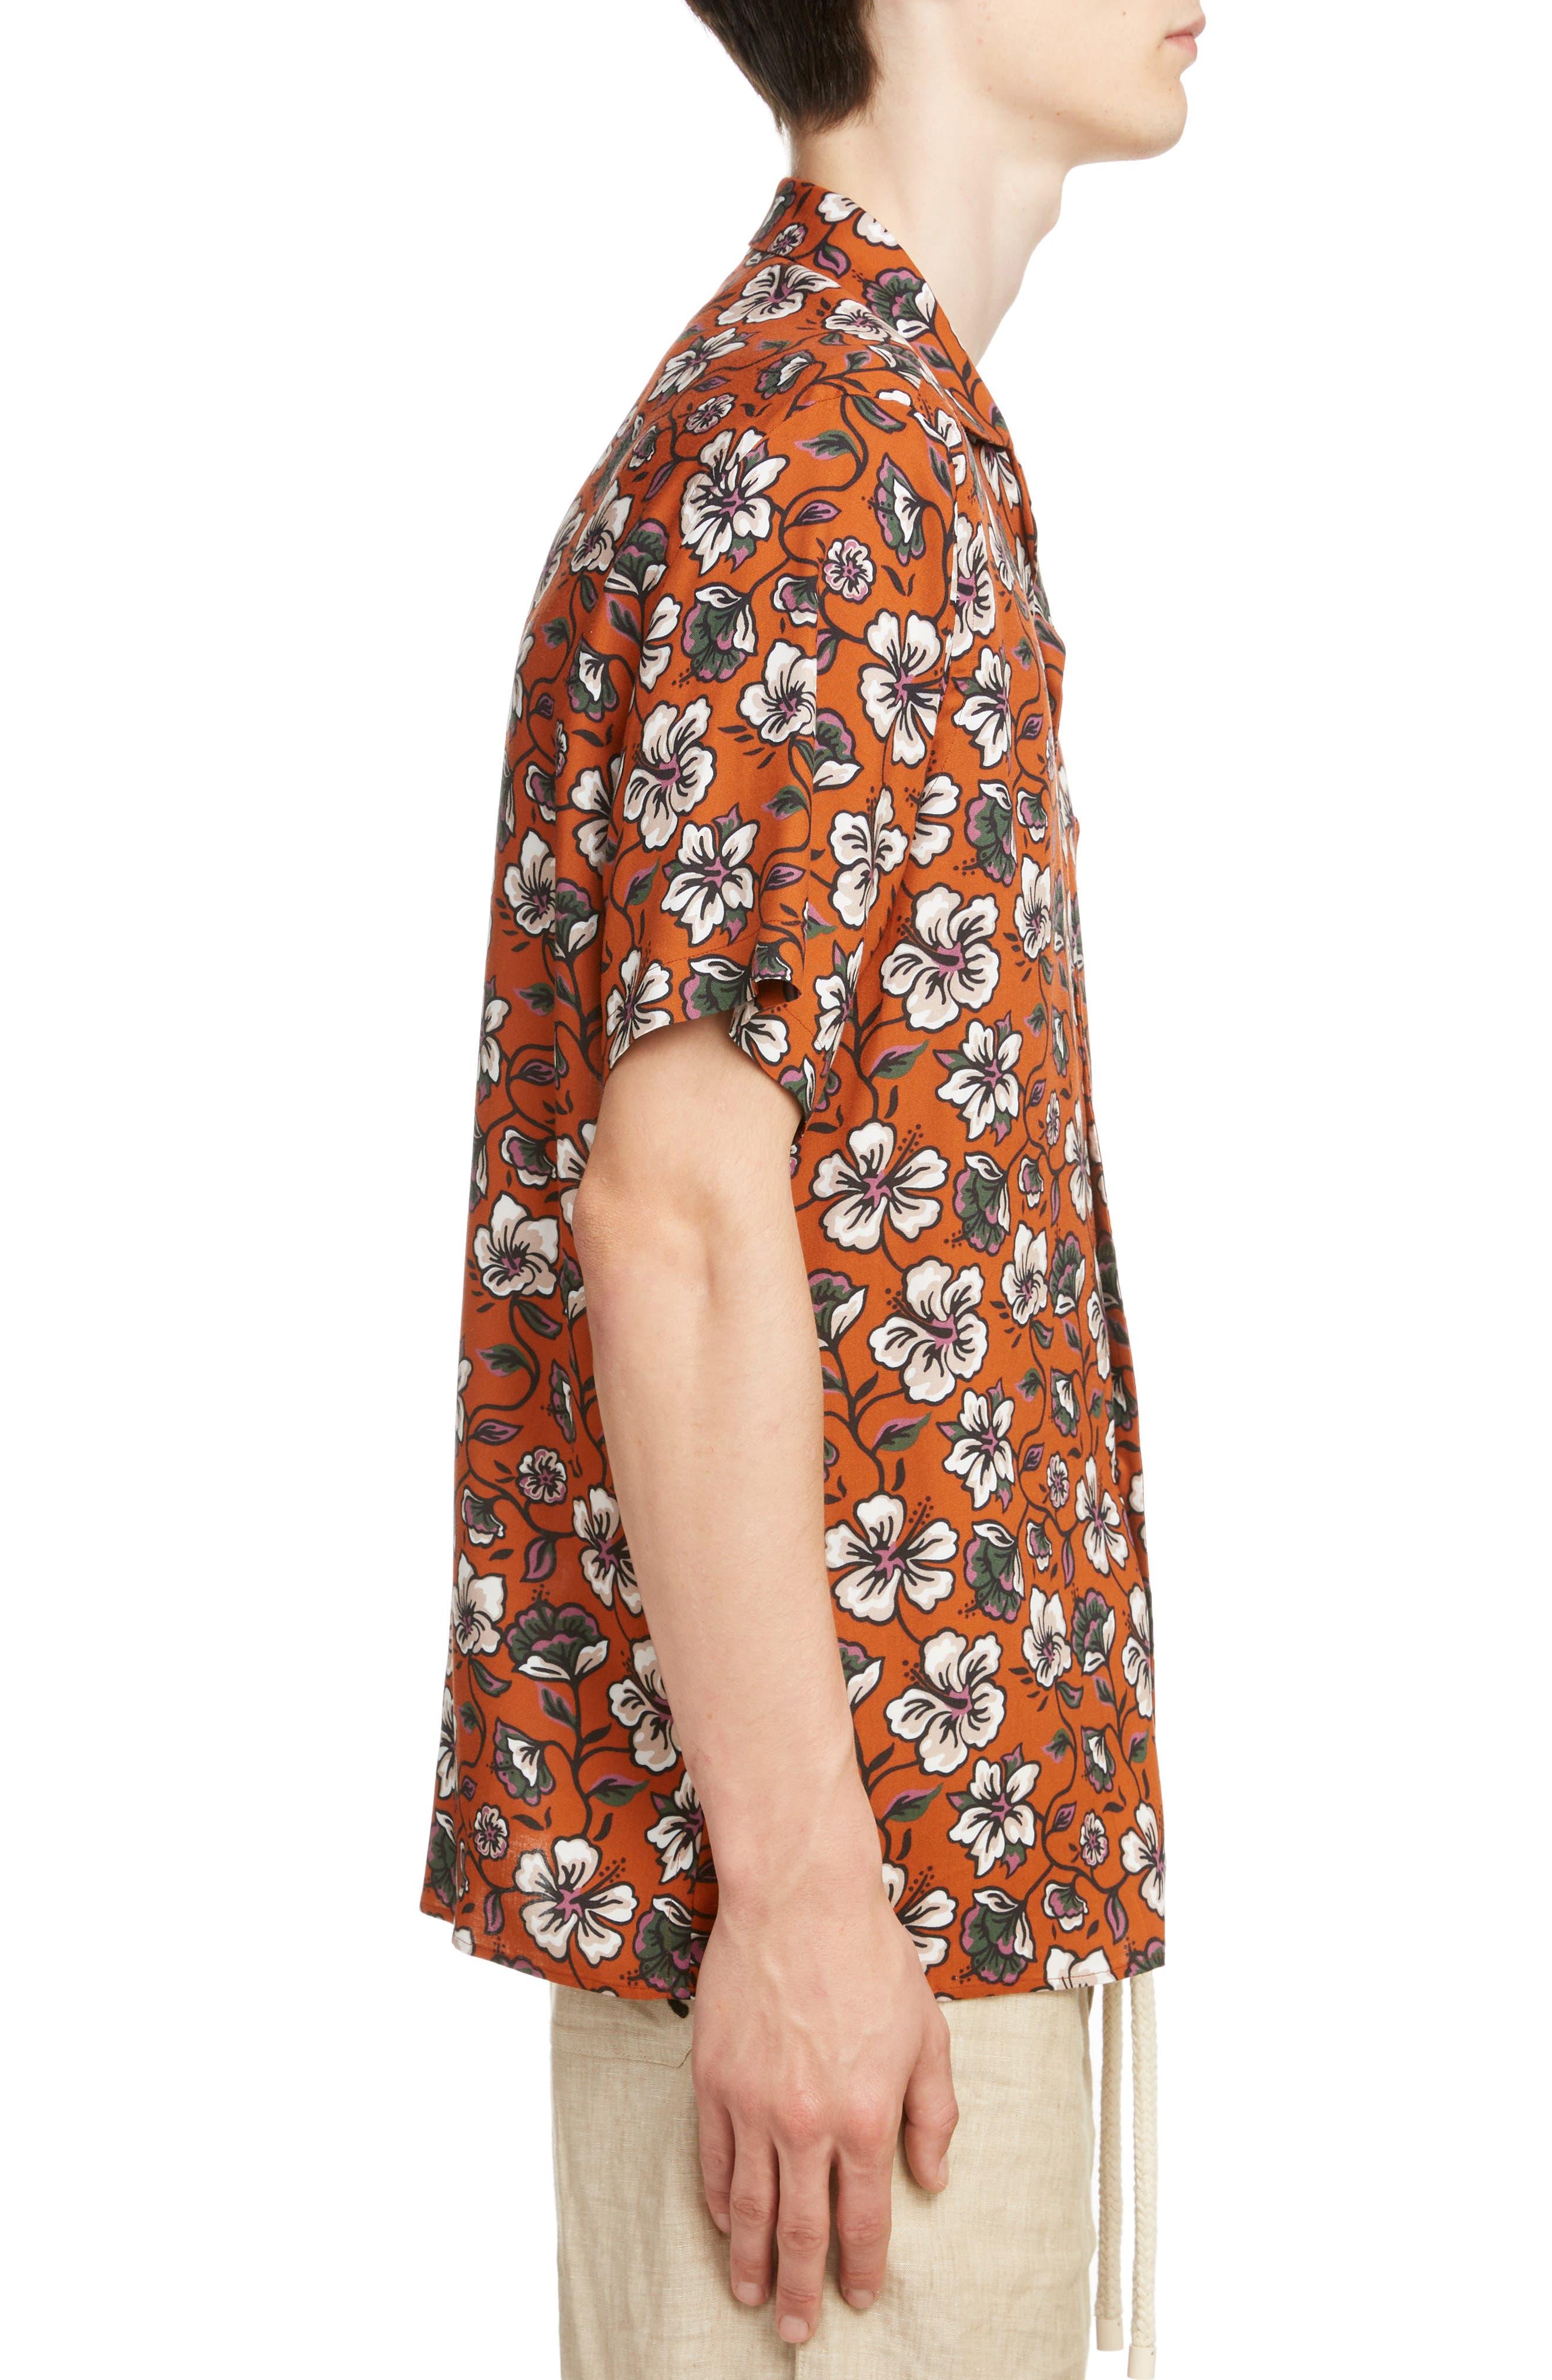 LOEWE,                             Floral Print Camp Shirt,                             Alternate thumbnail 4, color,                             2103-WHITE/ BROWN